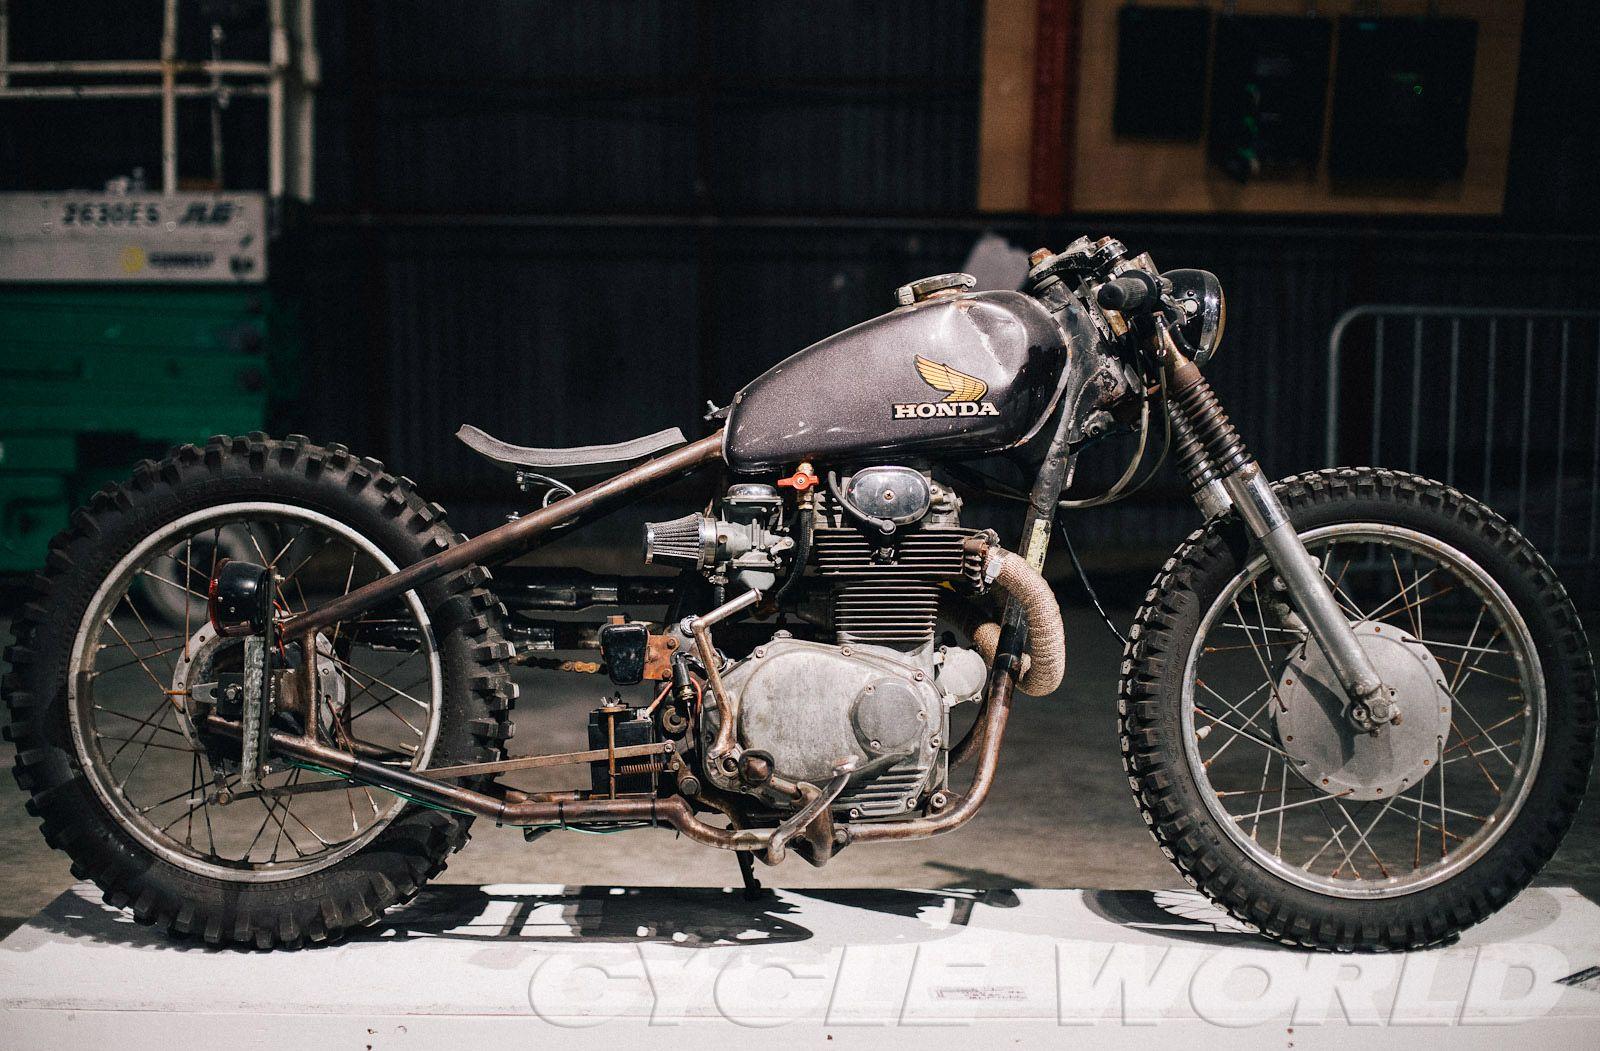 Honda CB 350 rigid